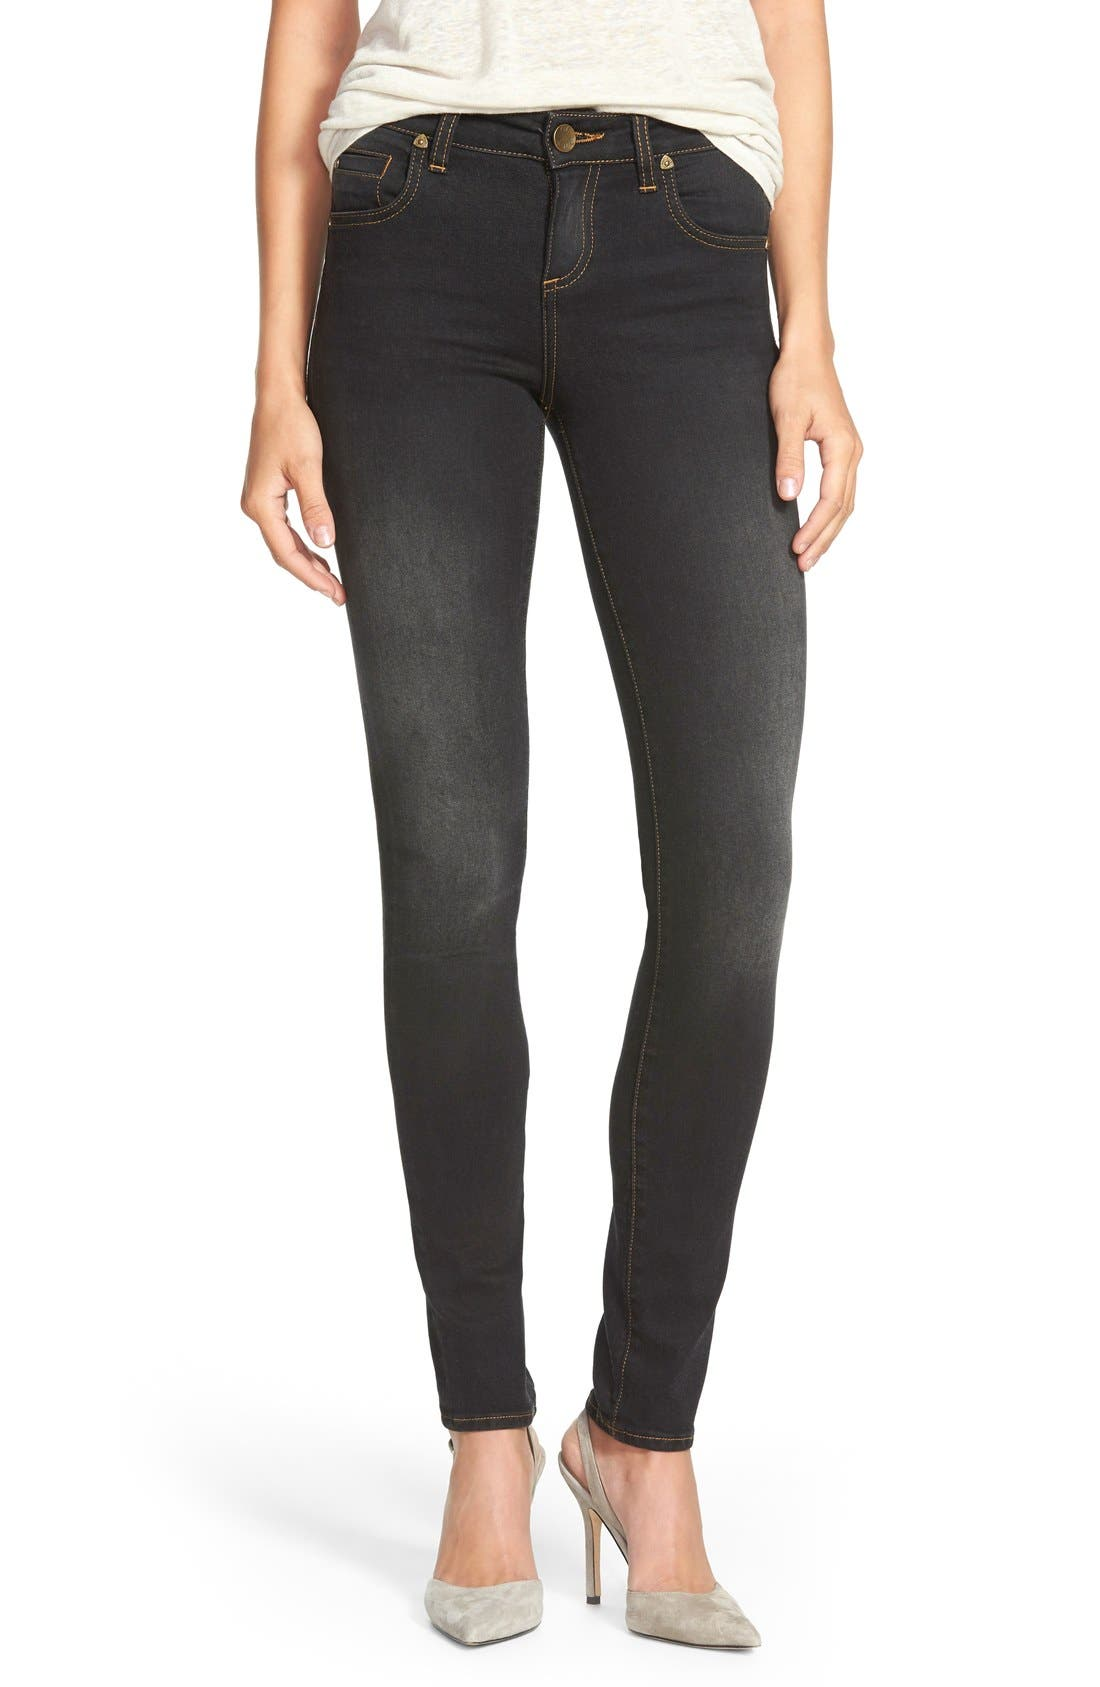 Main Image - KUT from the Kloth 'Diana' Stretch Skinny Jeans (Black) (Regular & Petite)